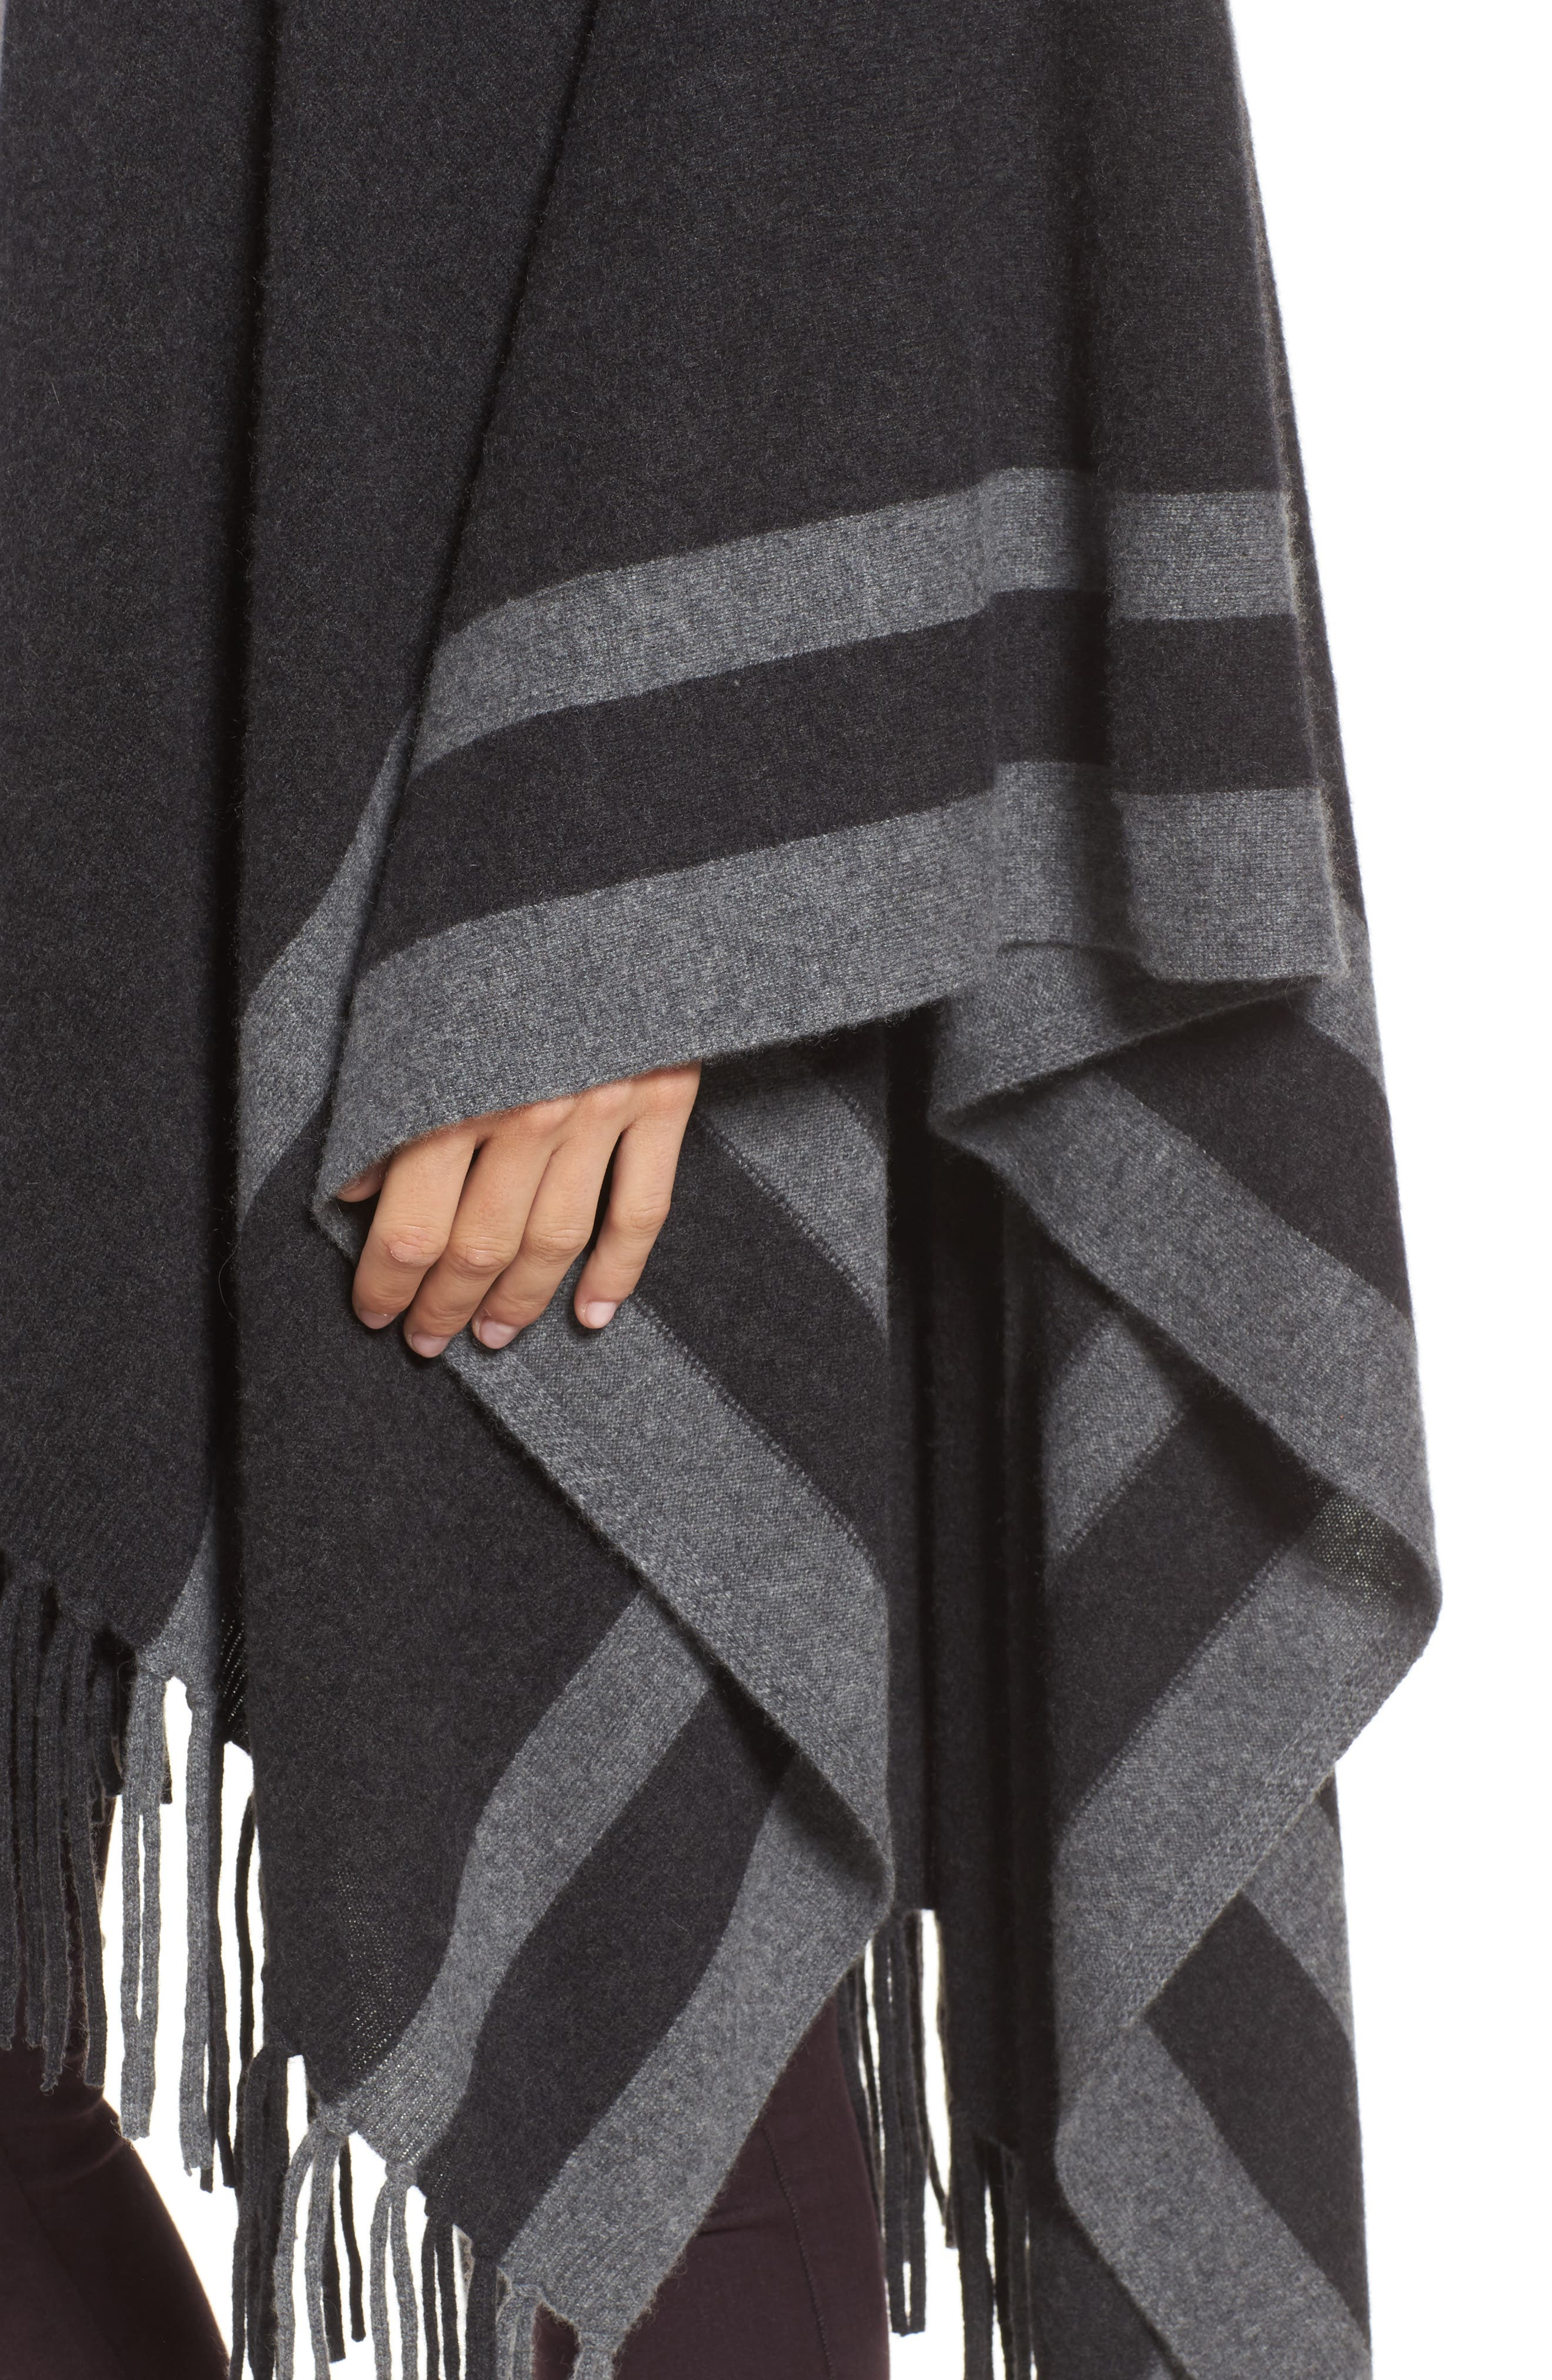 Luxe Stripe Cashmere Ruana,                             Alternate thumbnail 4, color,                             Black Rock Heather Combo